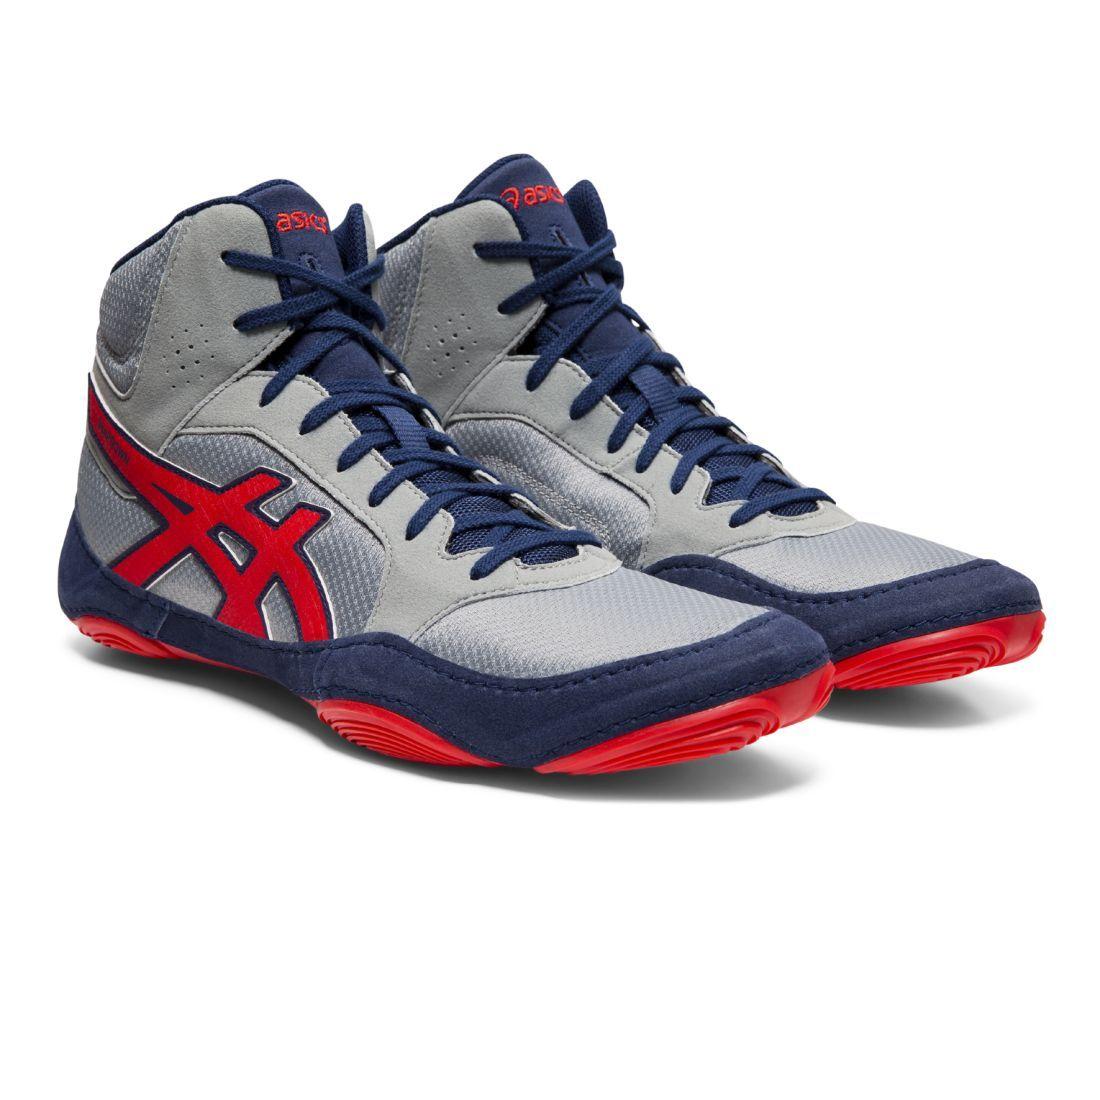 Buy Asics SNAPDOWN II wrestling shoes